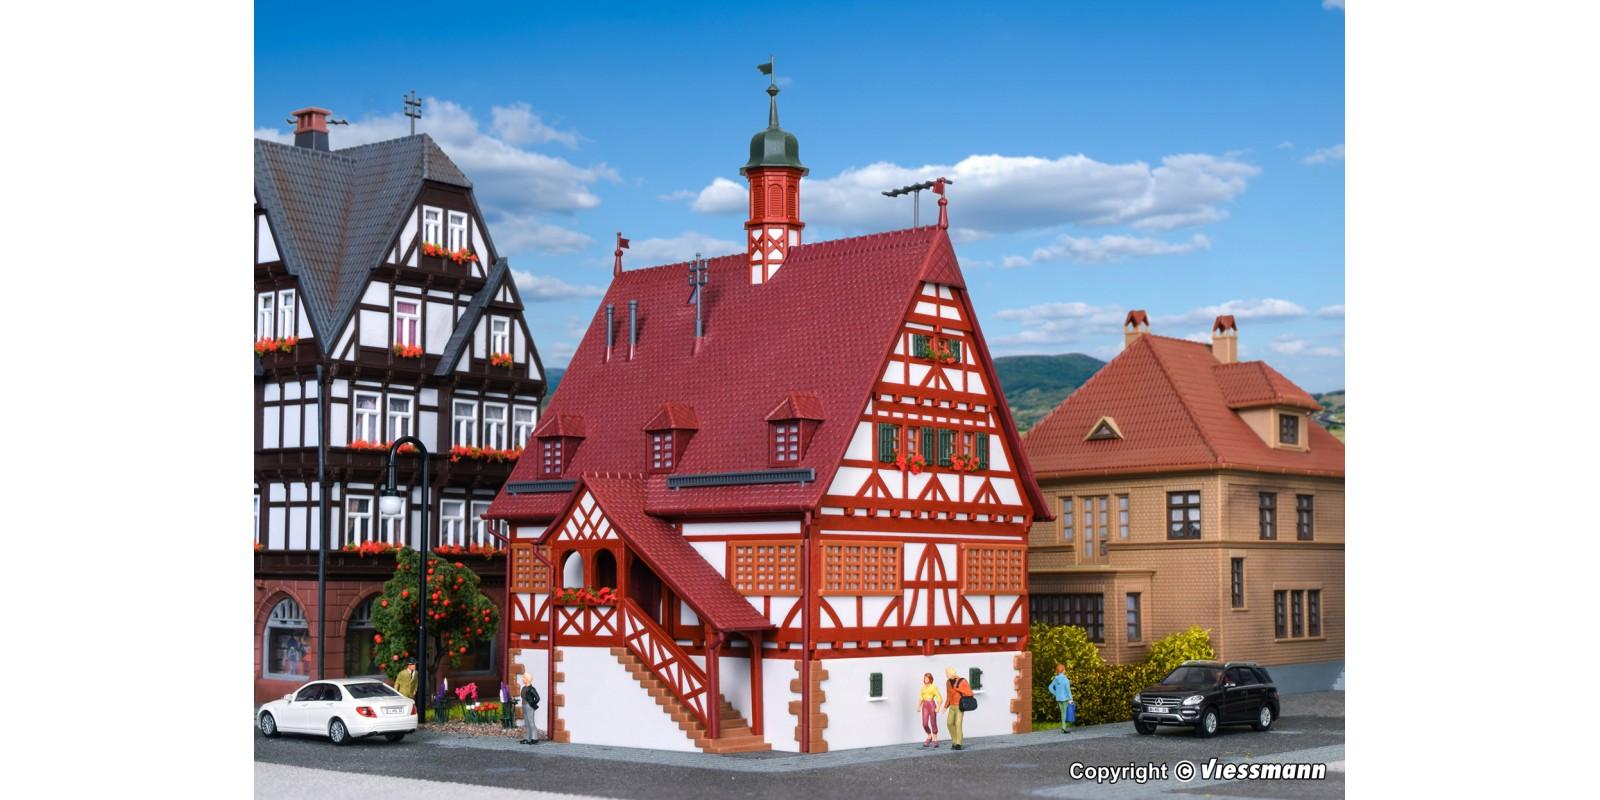 KI38906 Town hall Maichingen